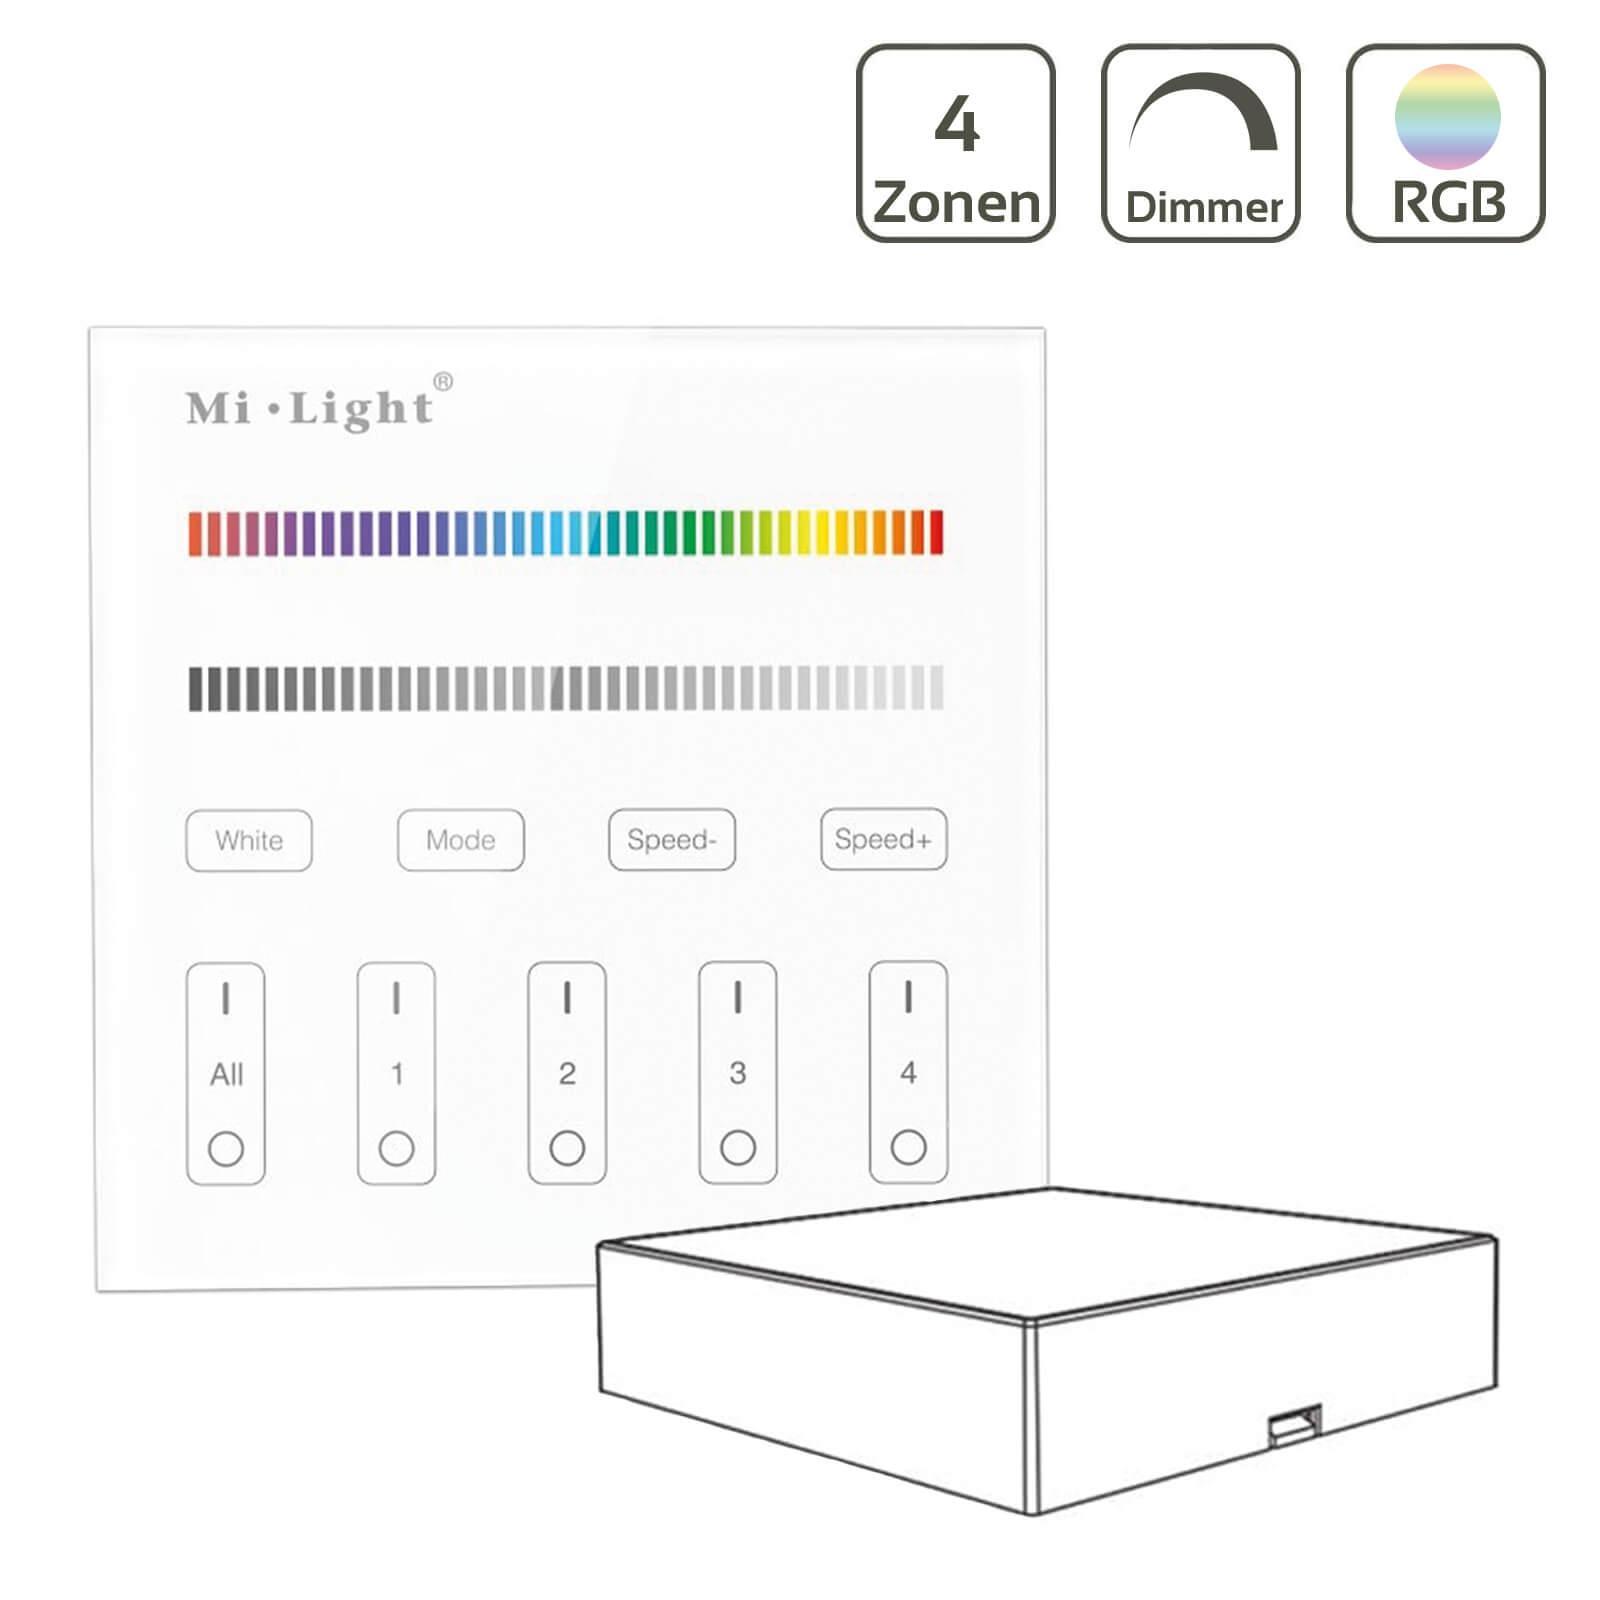 MiBoxer RGBW Wandschalter 4 Zonen Aufbau Dimmen Schalten Farbsteuerung batteriebetrieben B3